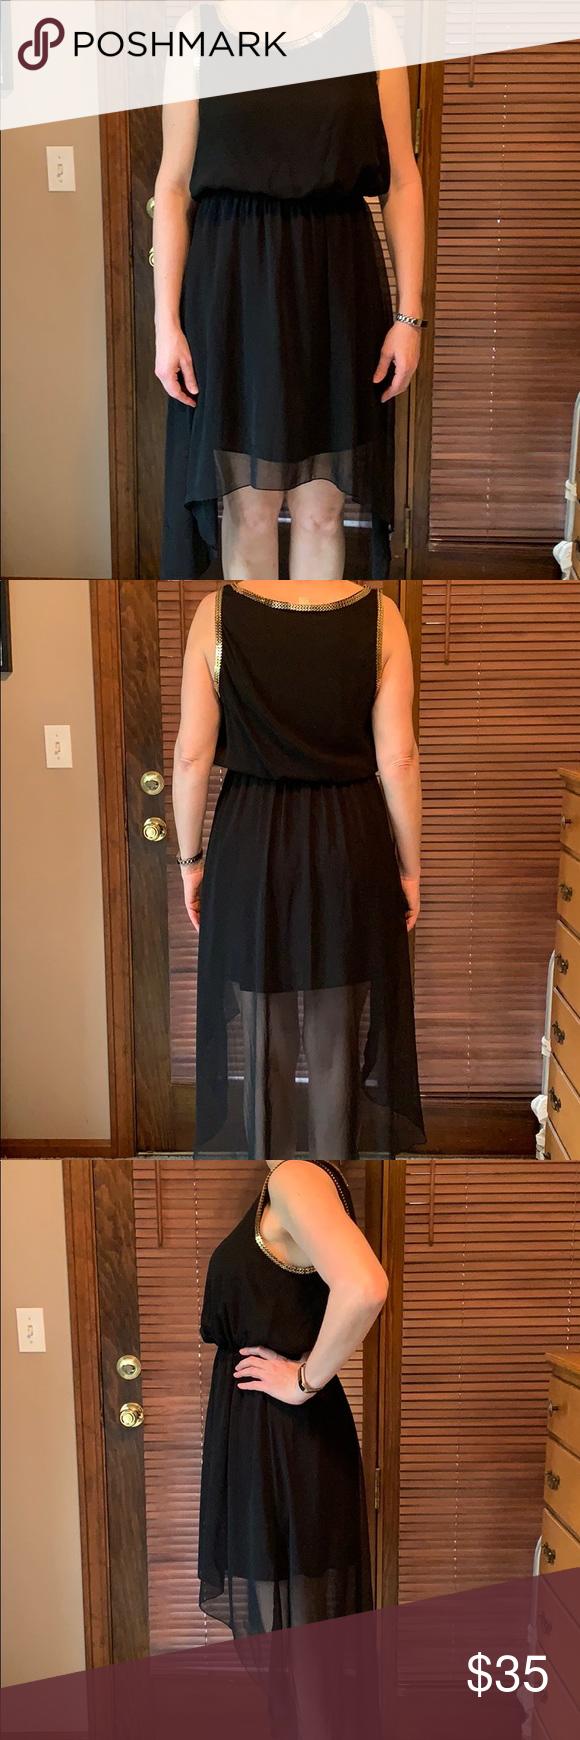 Black Asymmetrical Sheer Dress W Gold Trim Sheer Dress Black Sheer Dress Dresses